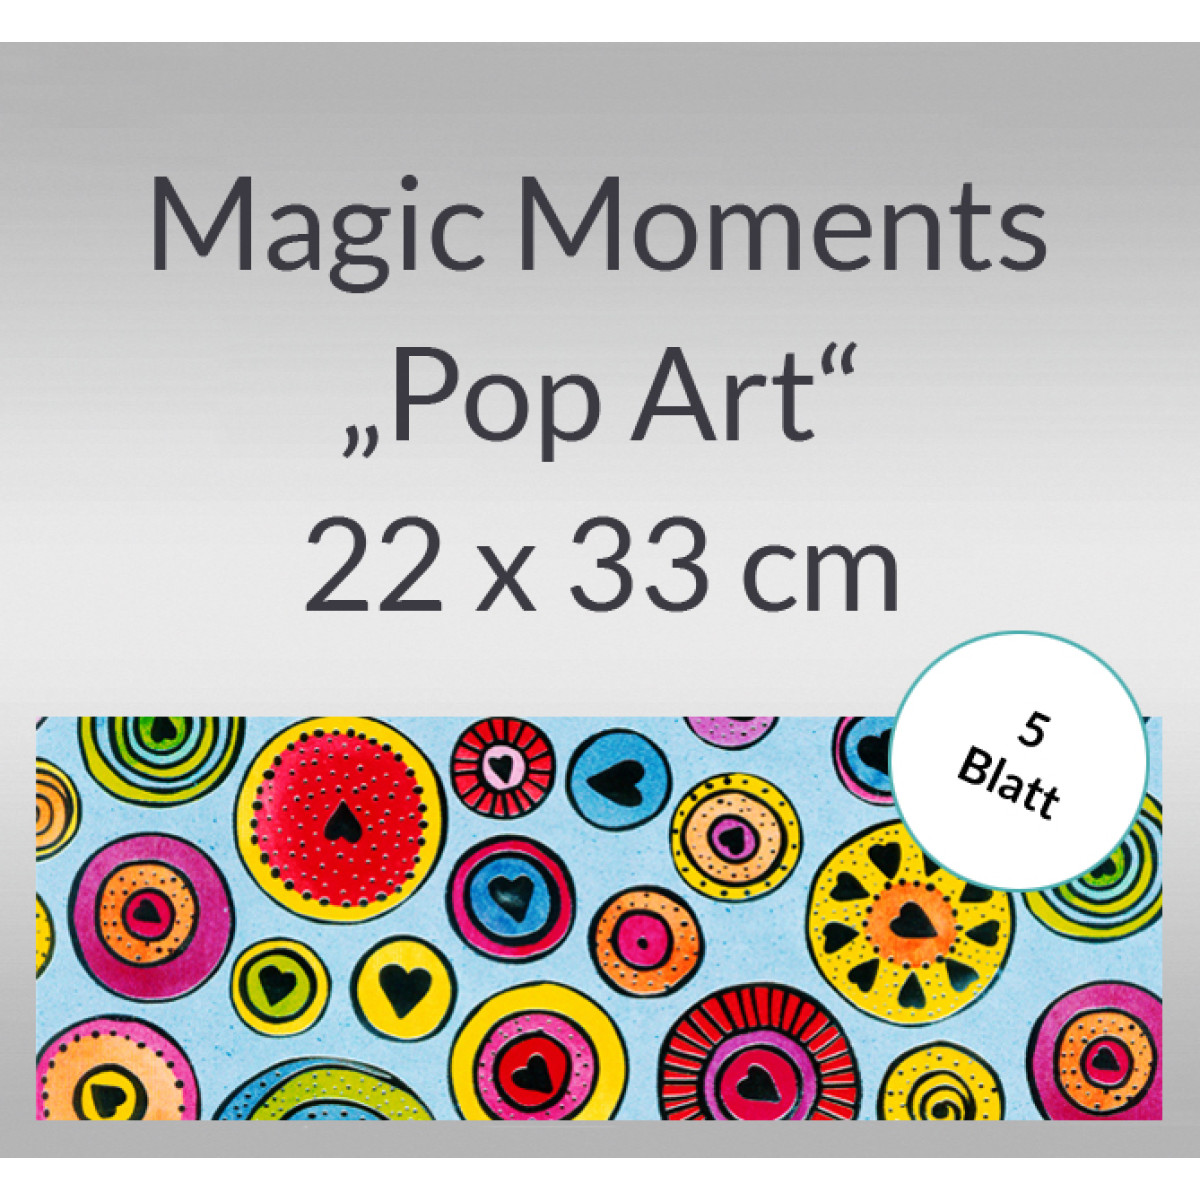 "Magic Moments ""Pop Art"" 22 x 33 cm - 5 Blatt"